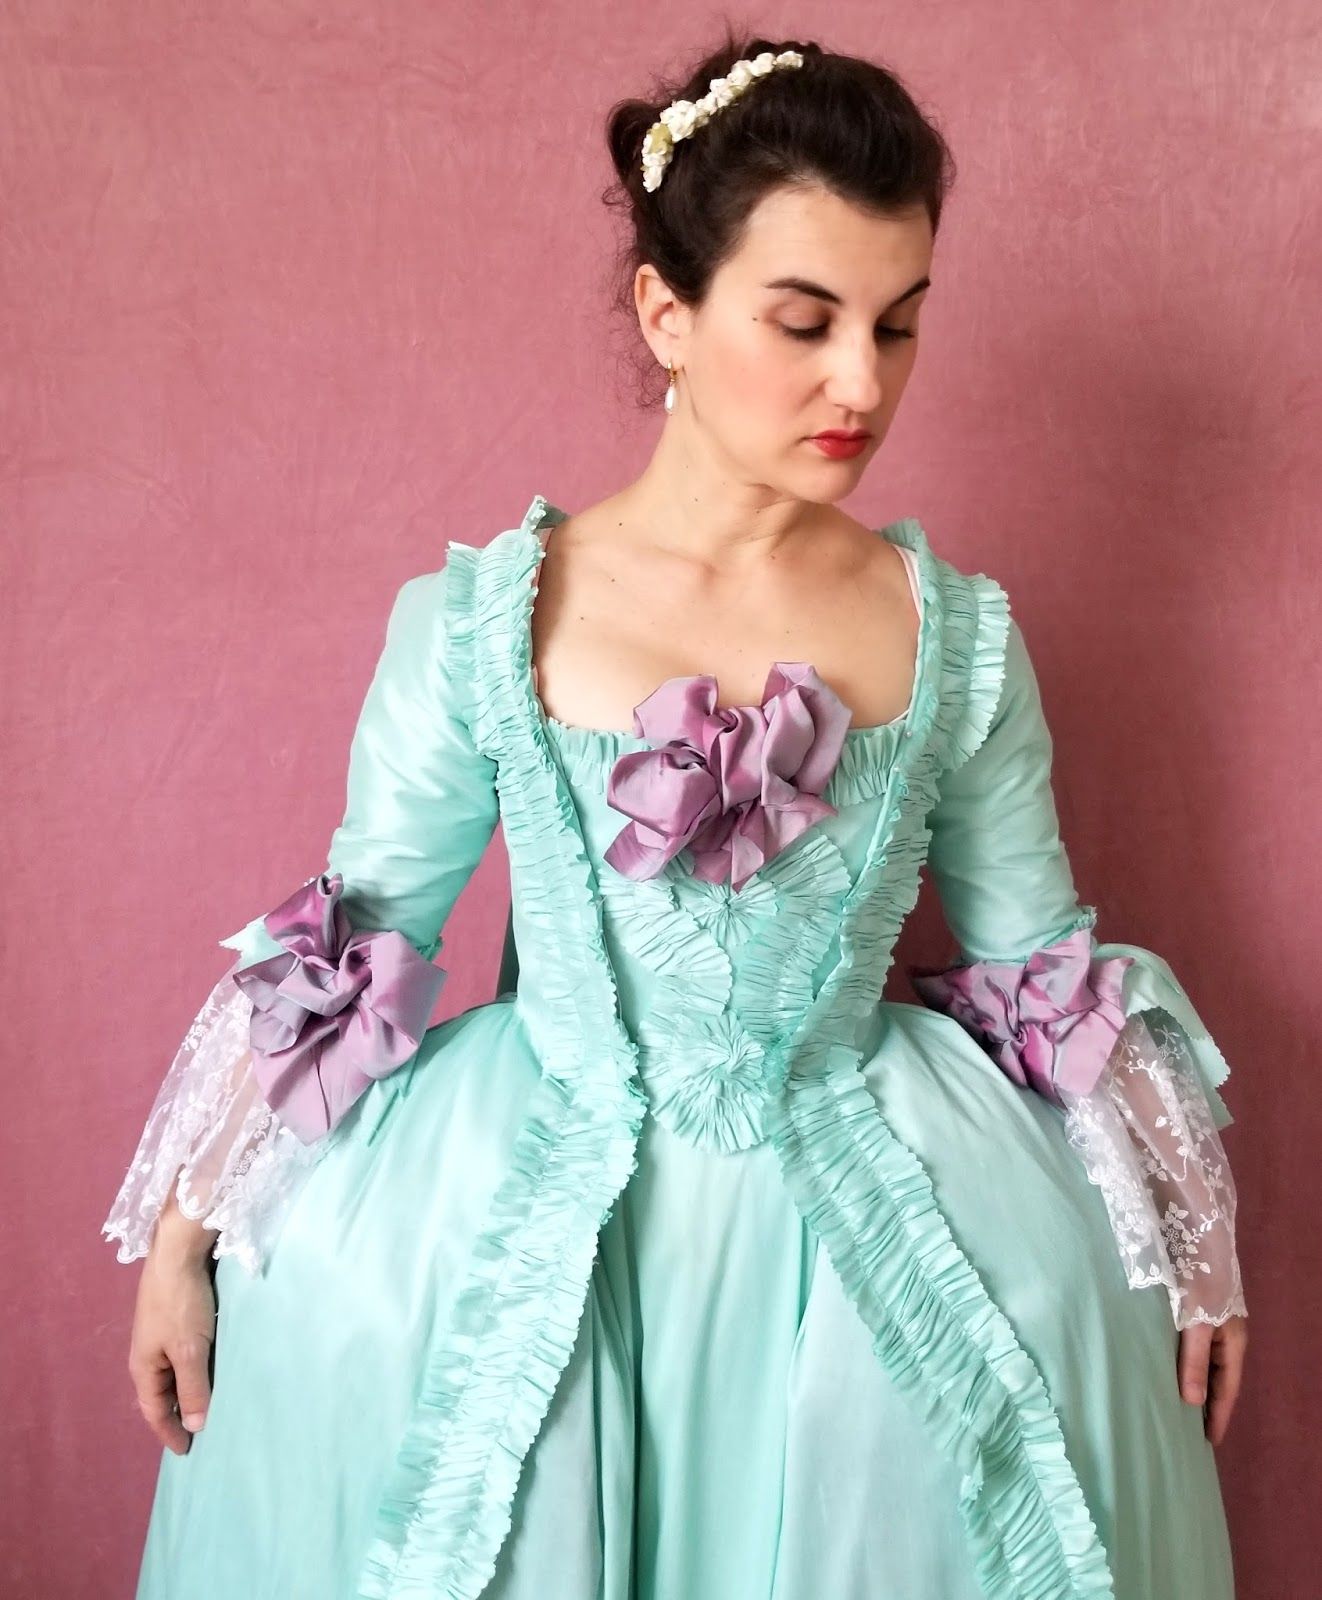 Robe A La Francaise: La Dauphine: Robe A La Francaise